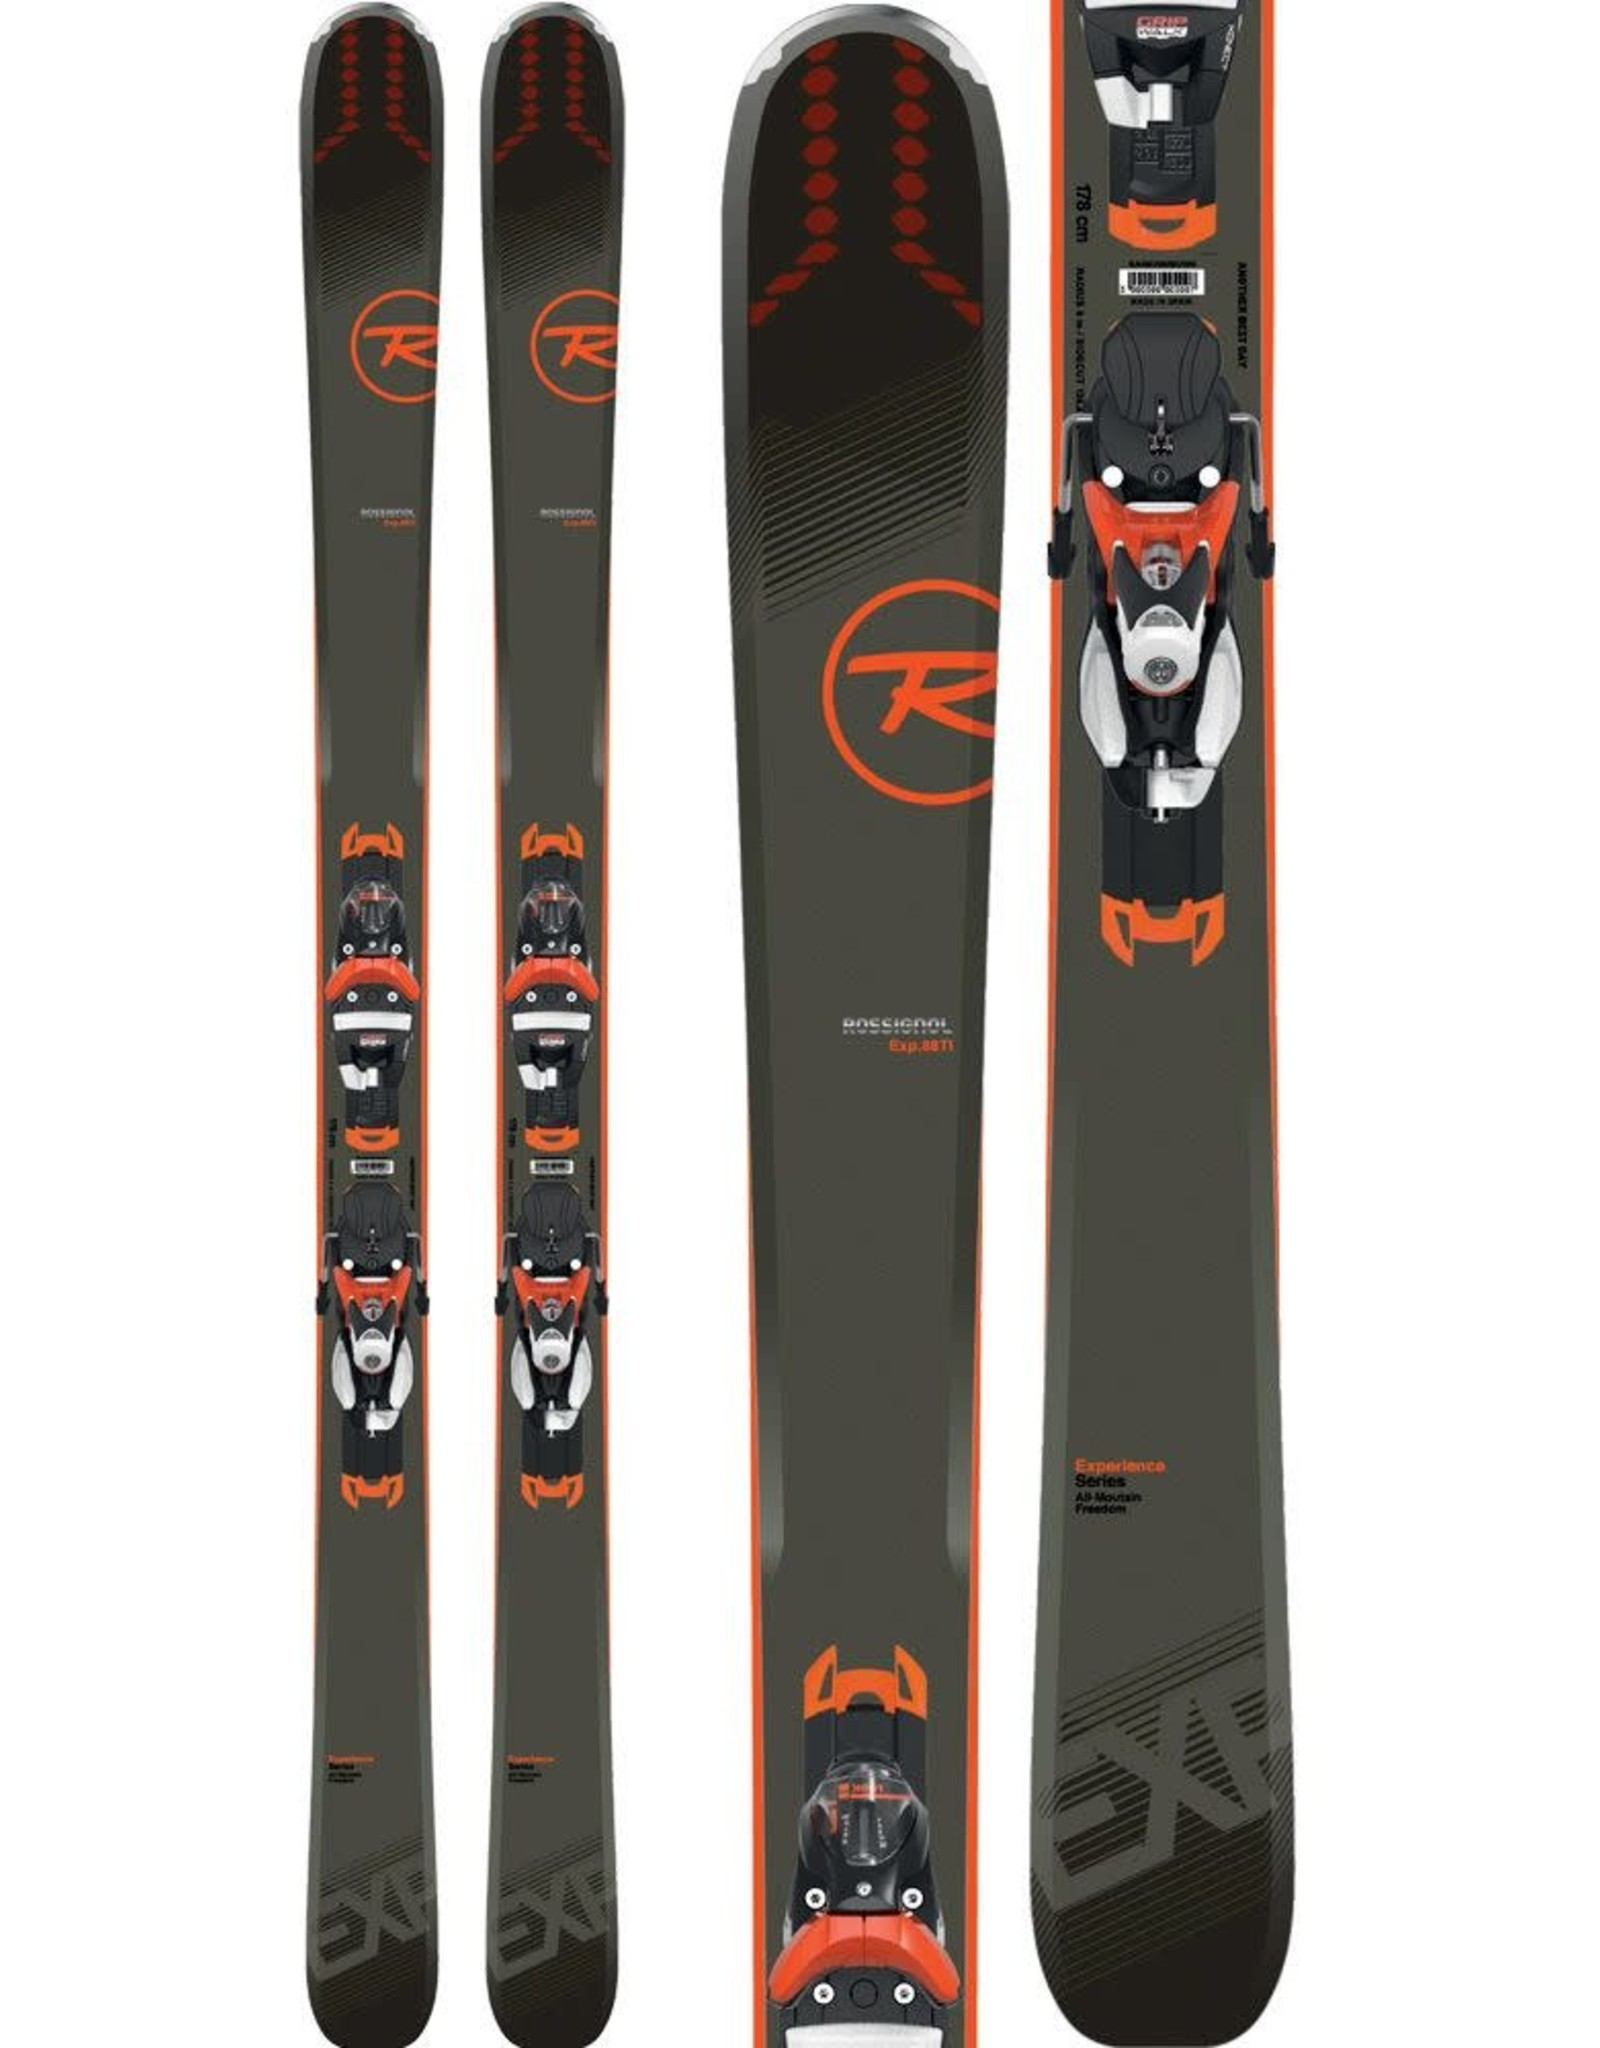 ROSSIGNOL DEMO***SK-4 Rossignol EXPERIENCE 88 HD Ski +Binding NX12 kONNECT -173